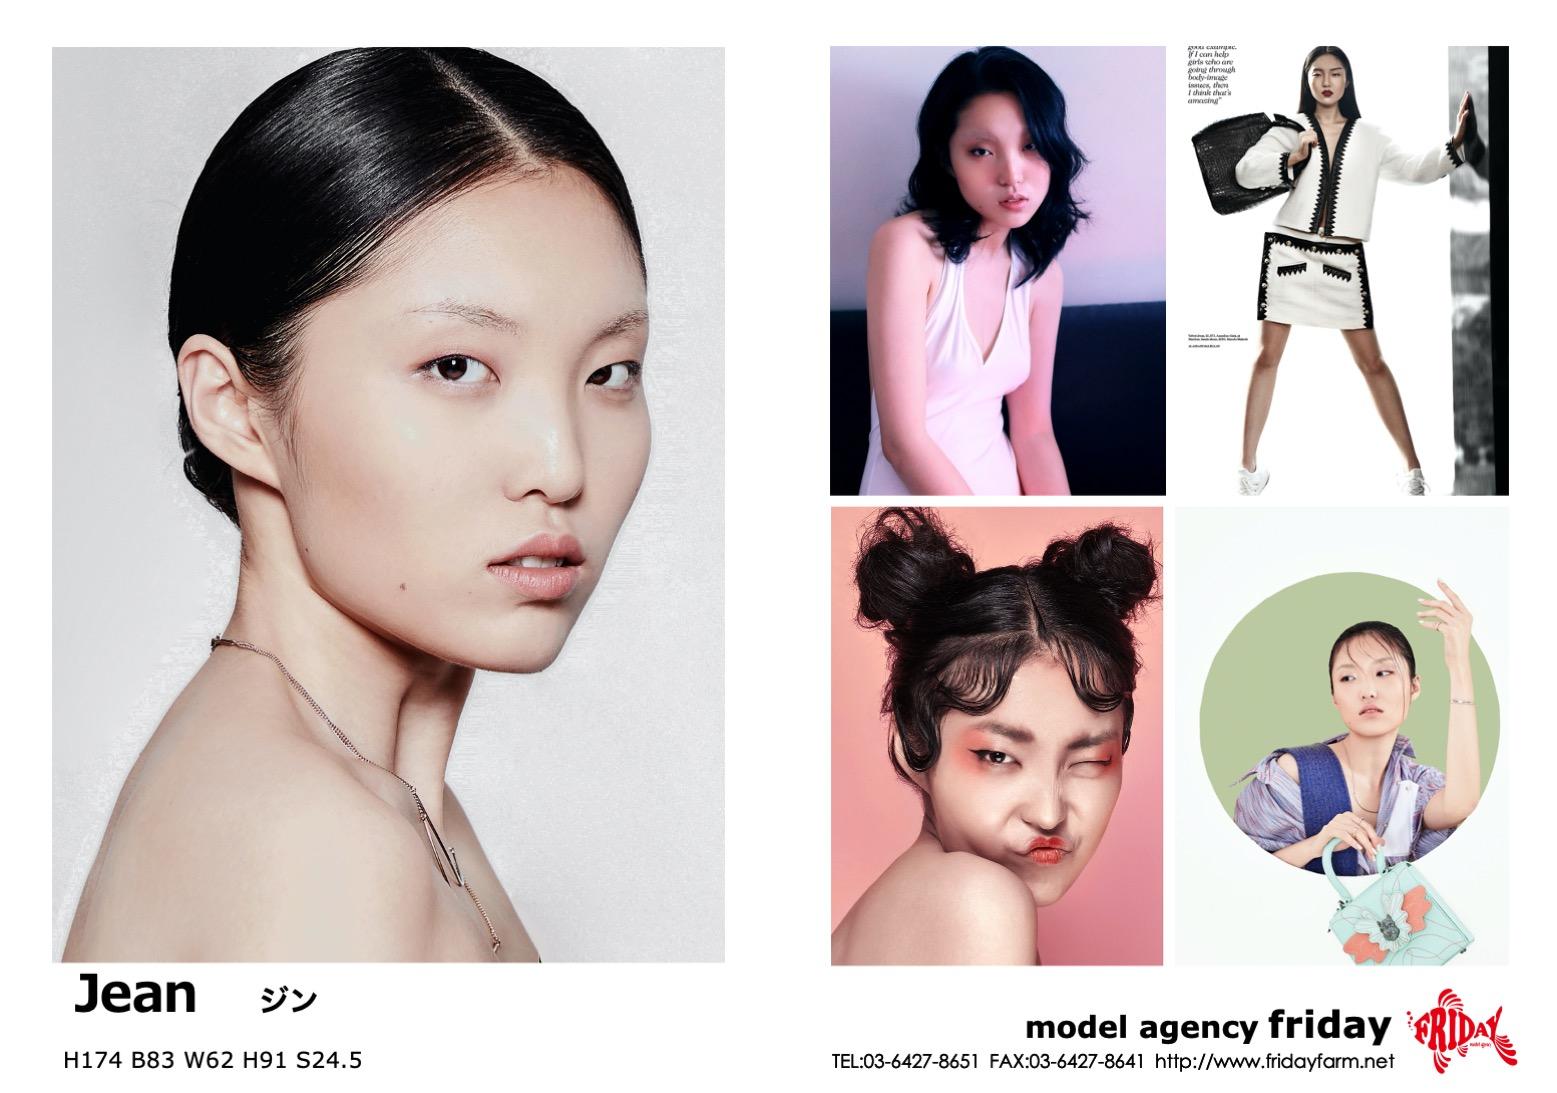 JEAN - ジン | model agency friday